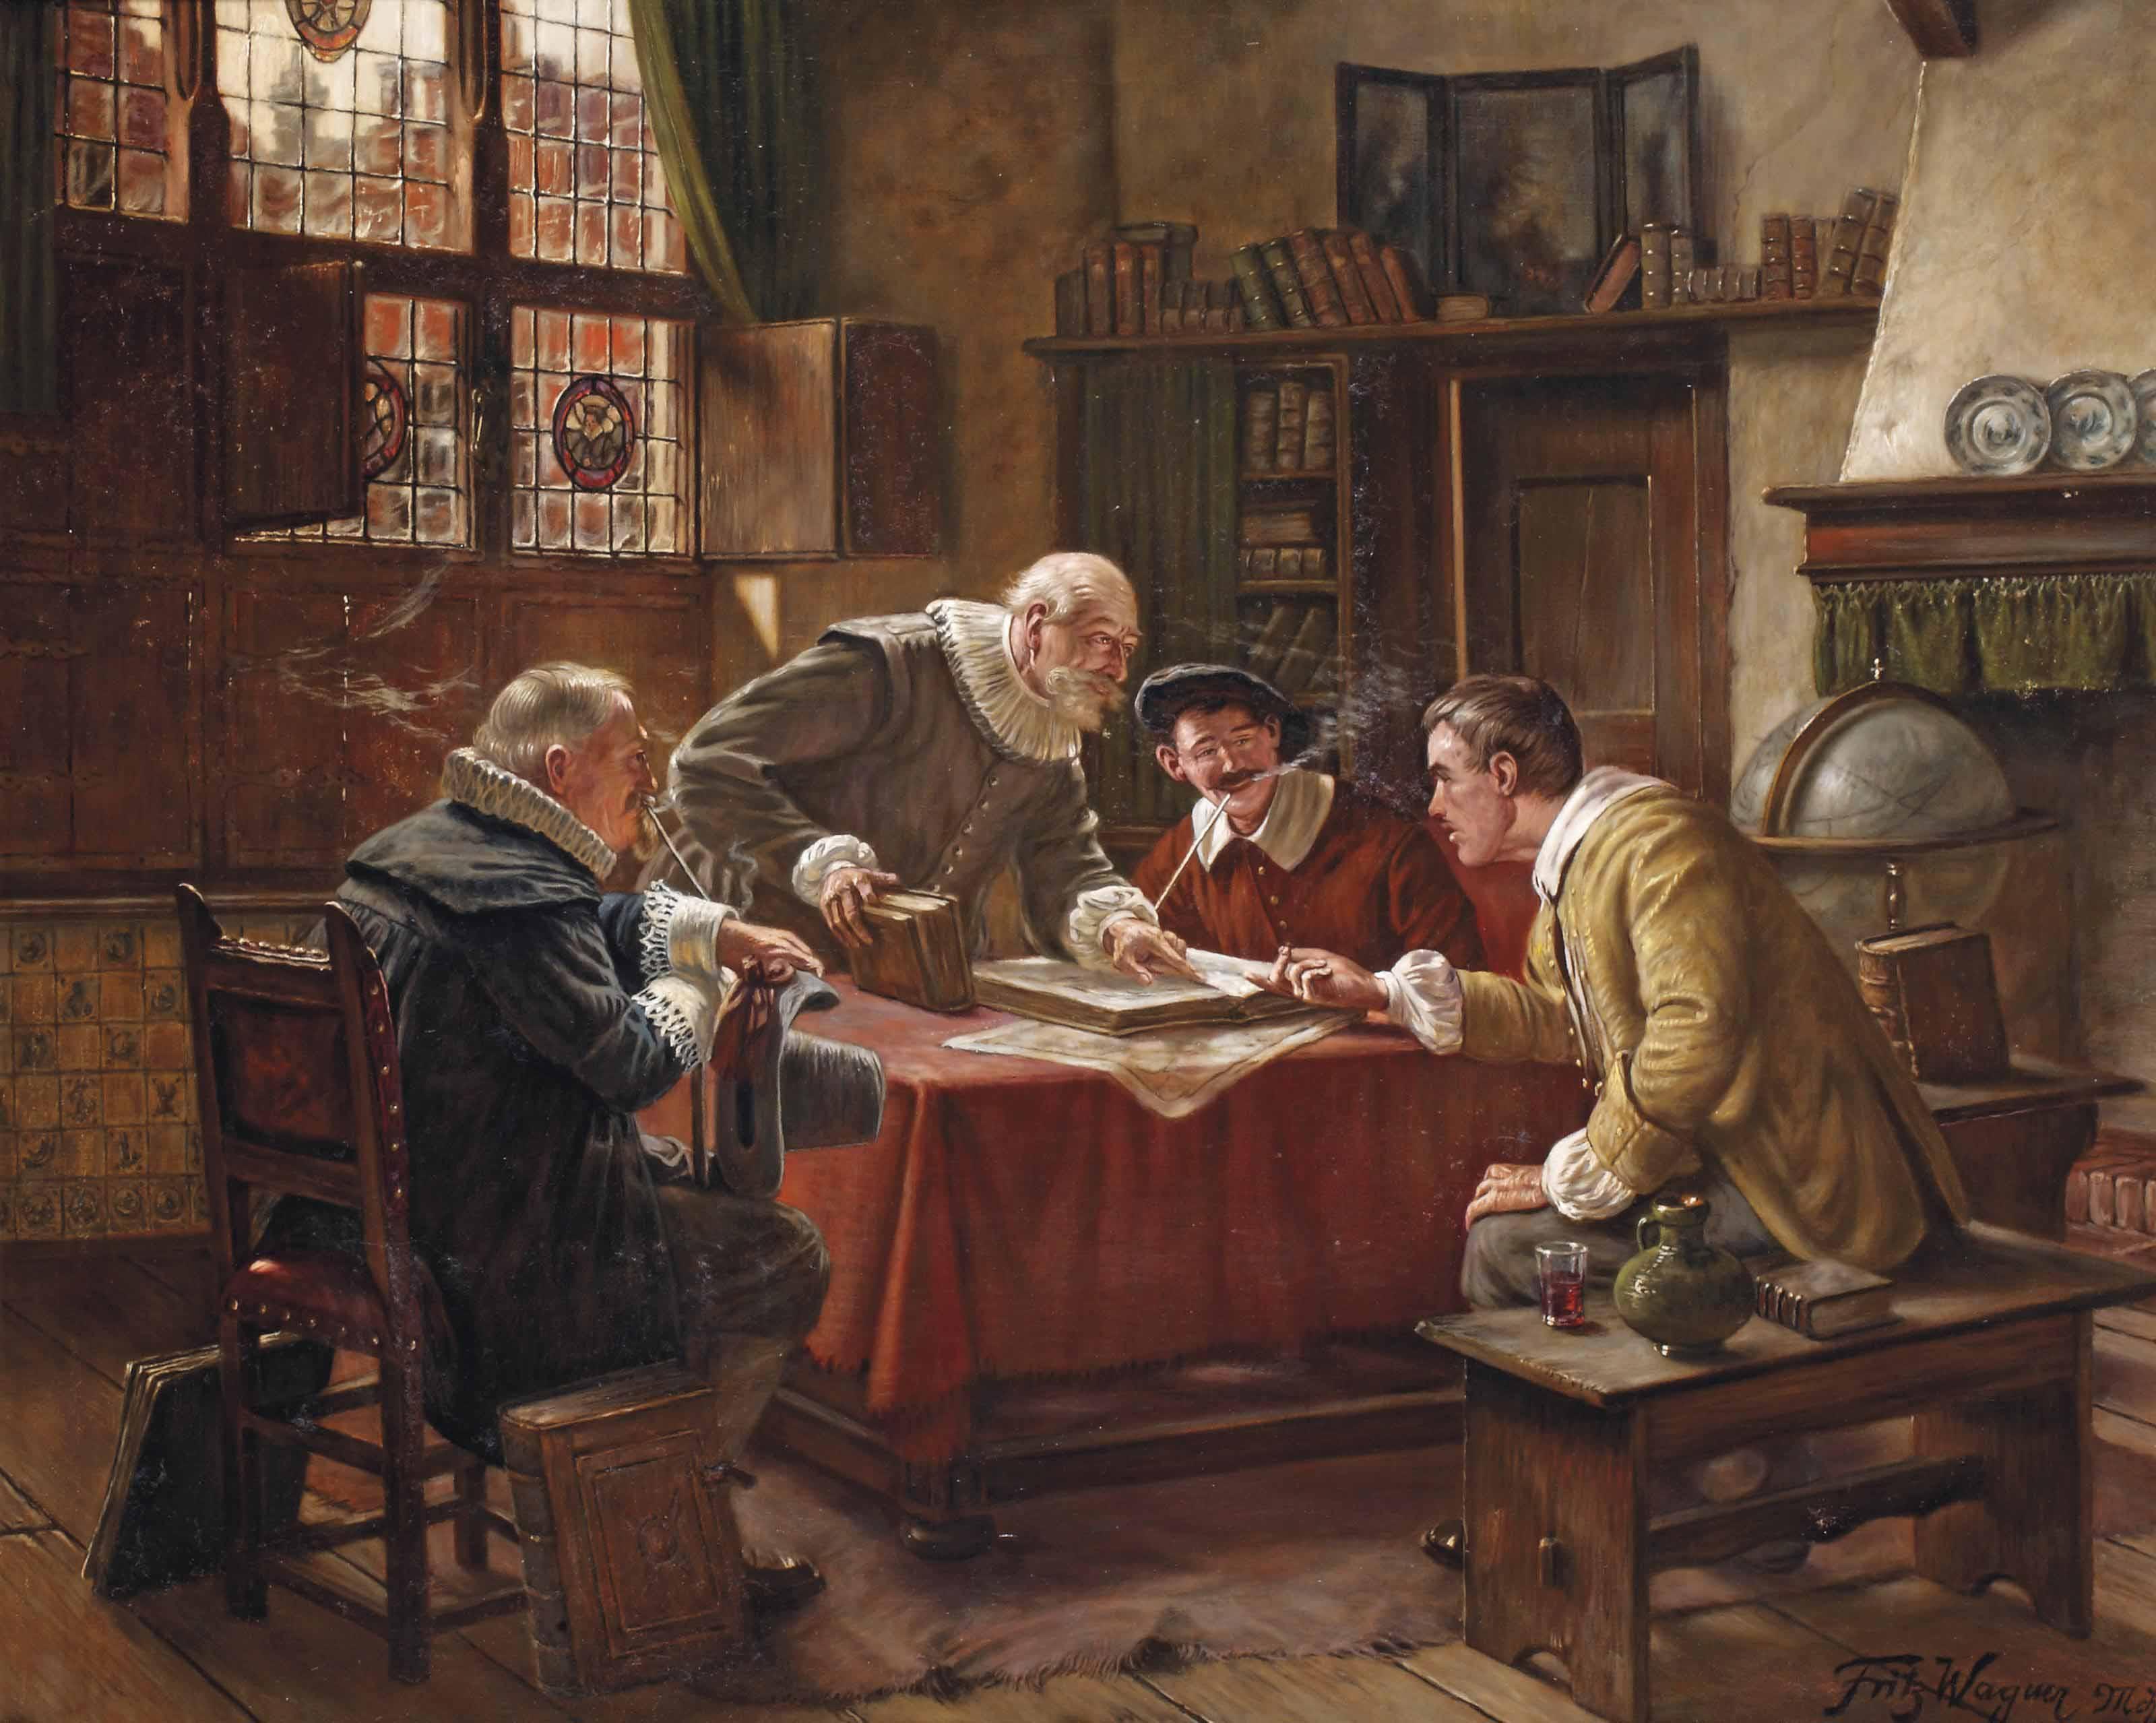 An interior with men conversing